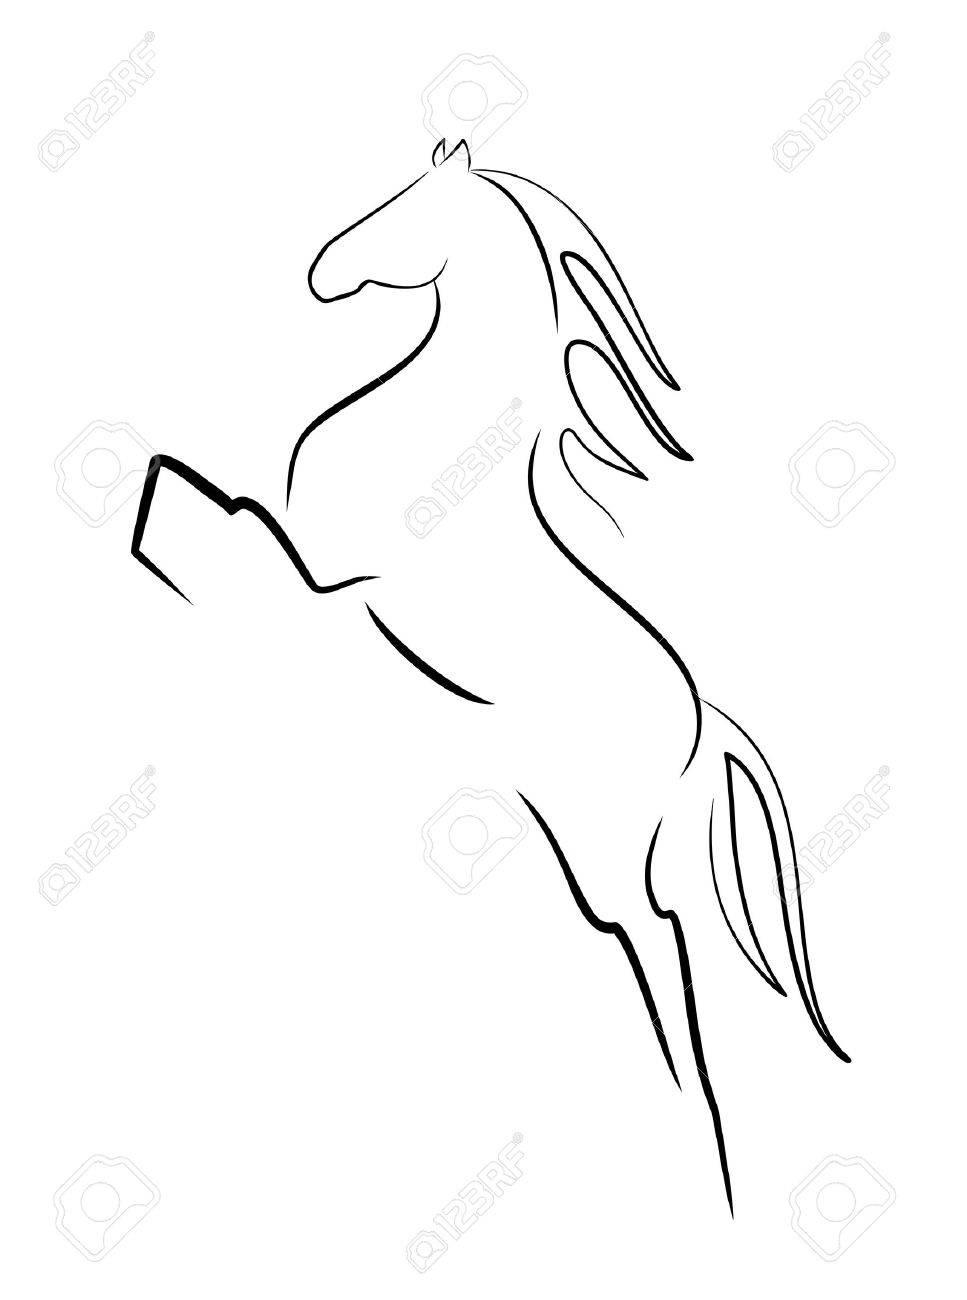 horse Stock Photo - 12842556